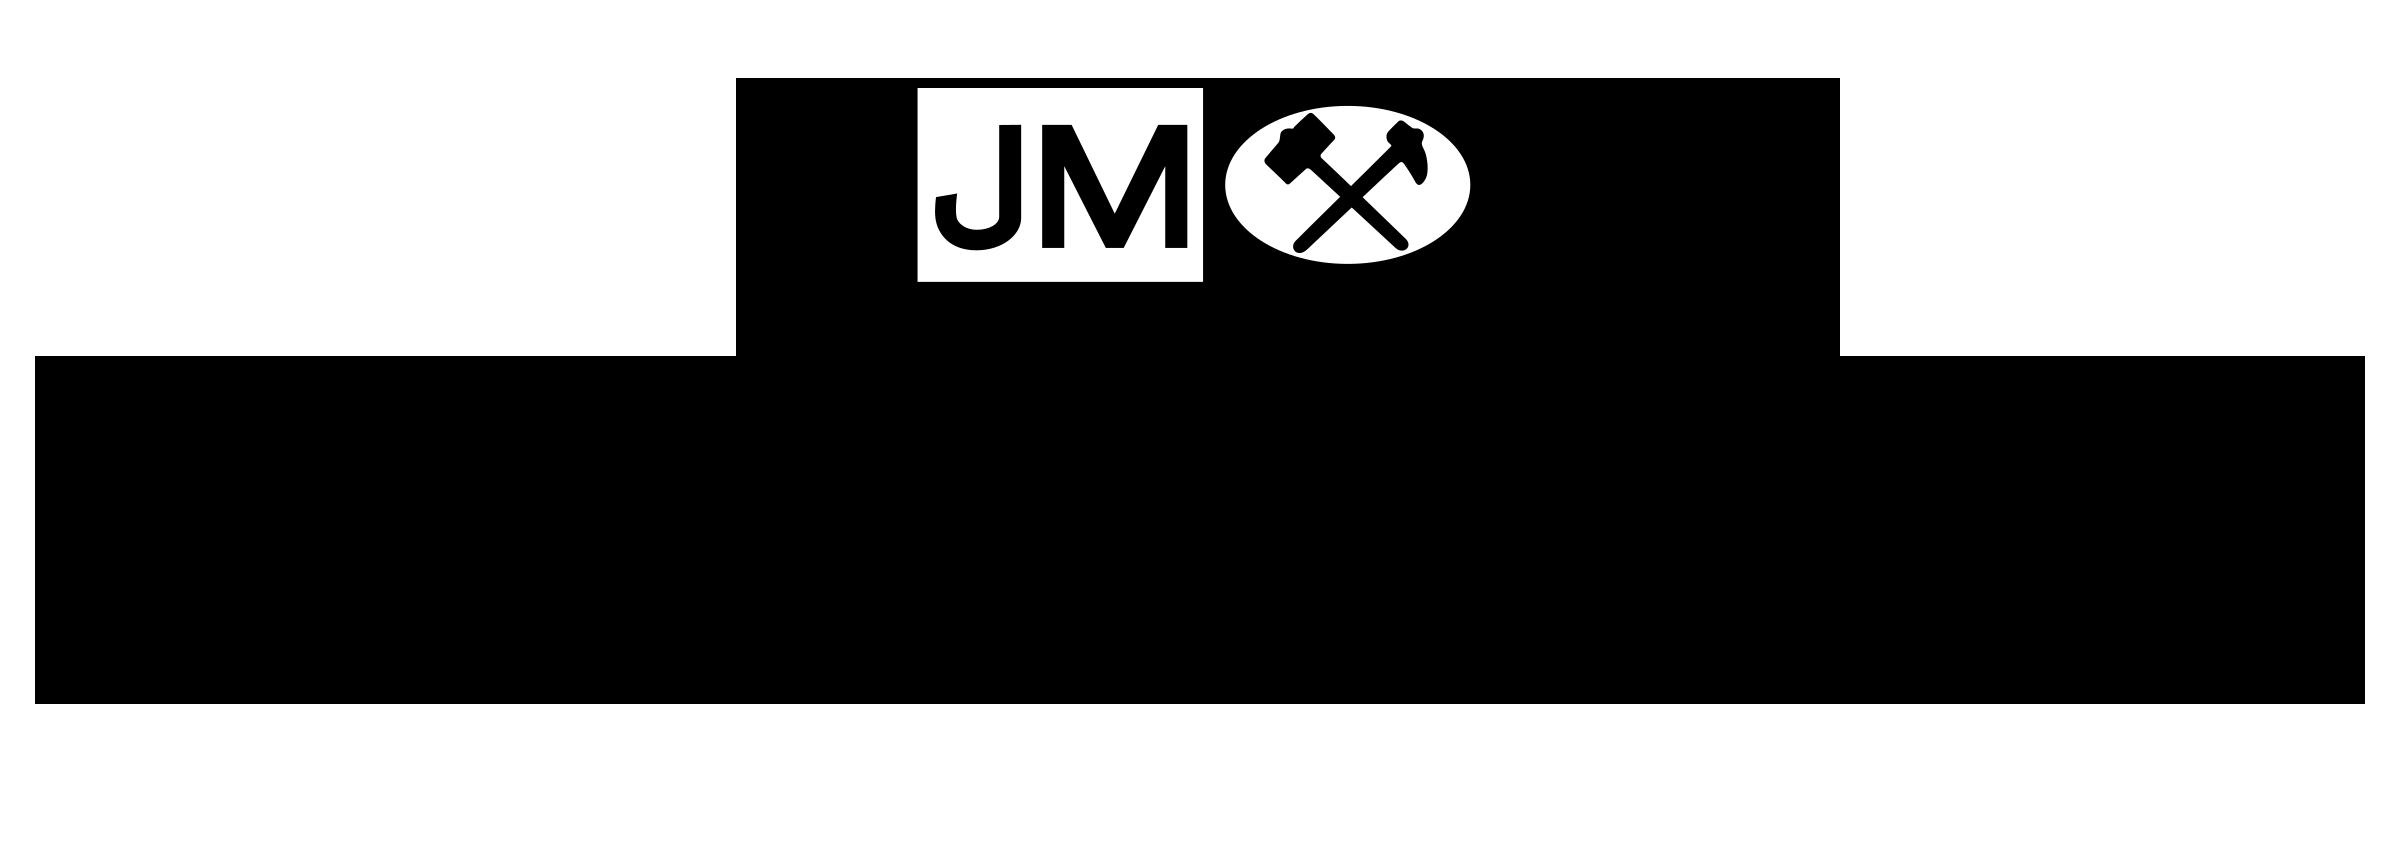 johnson-matthey-logo-png-transparent